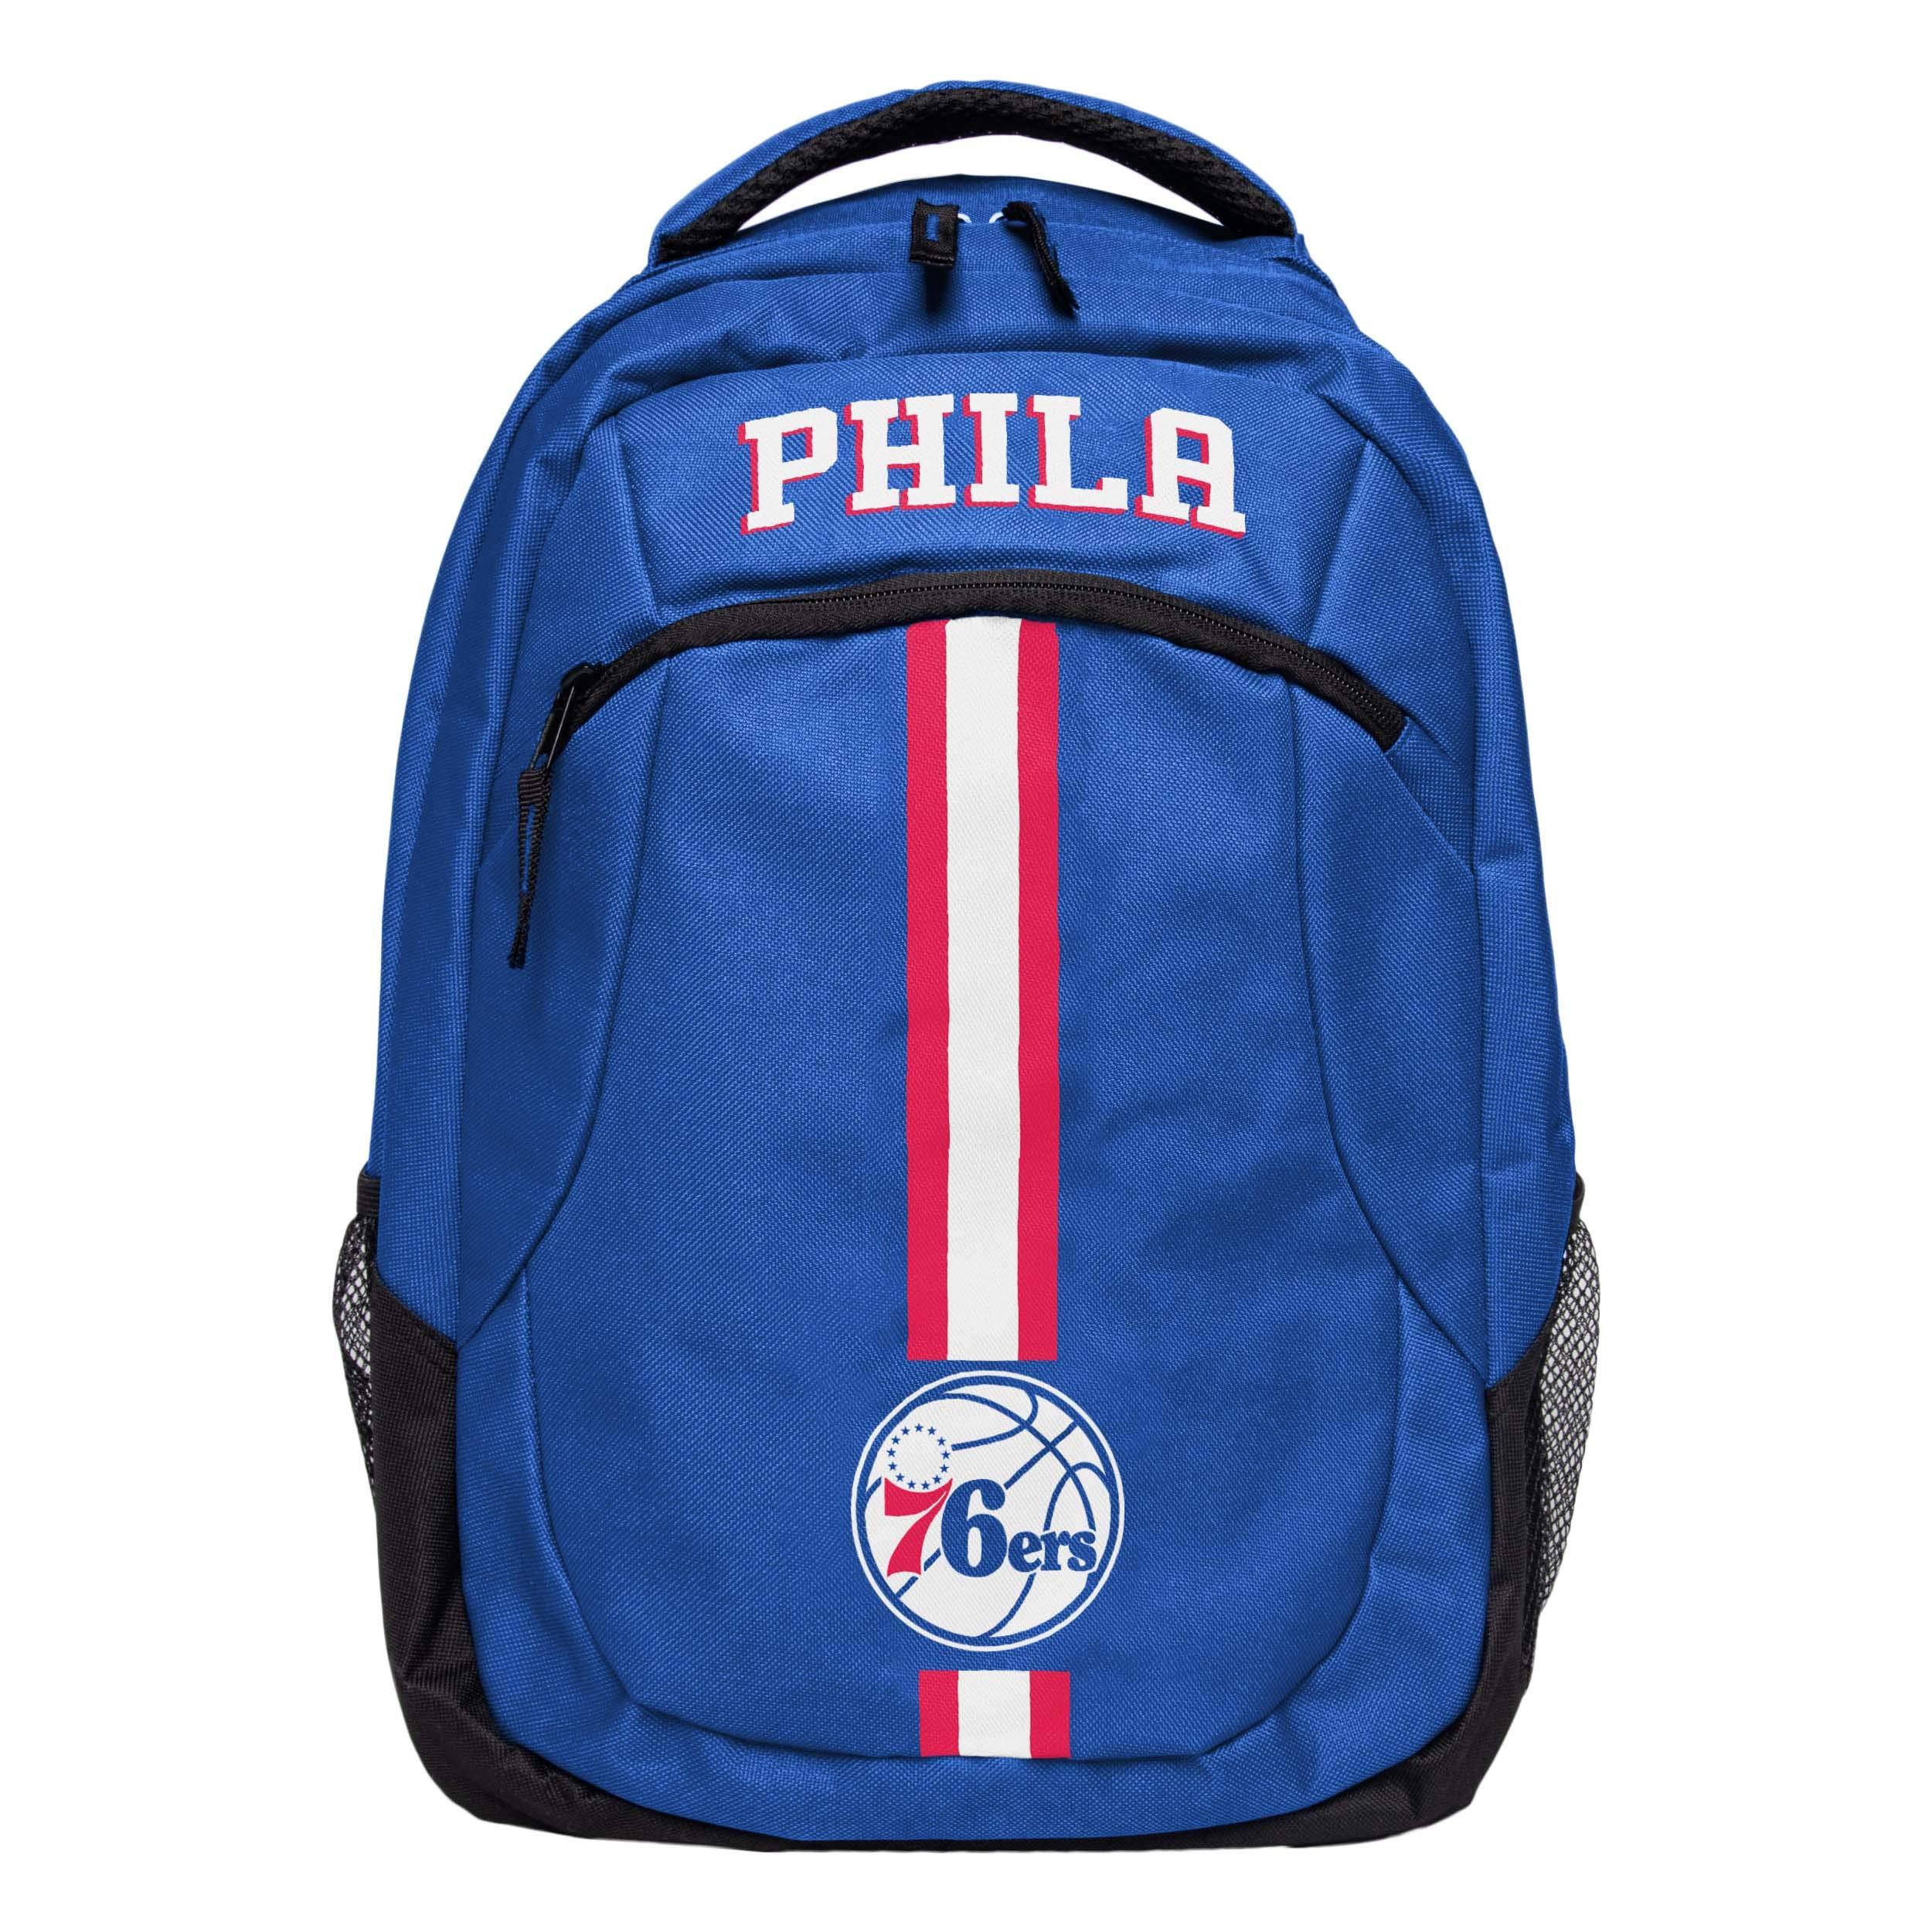 FOCO NBA Philadelphia 76ers Action BackpackAction Backpack, Team Color, One Size